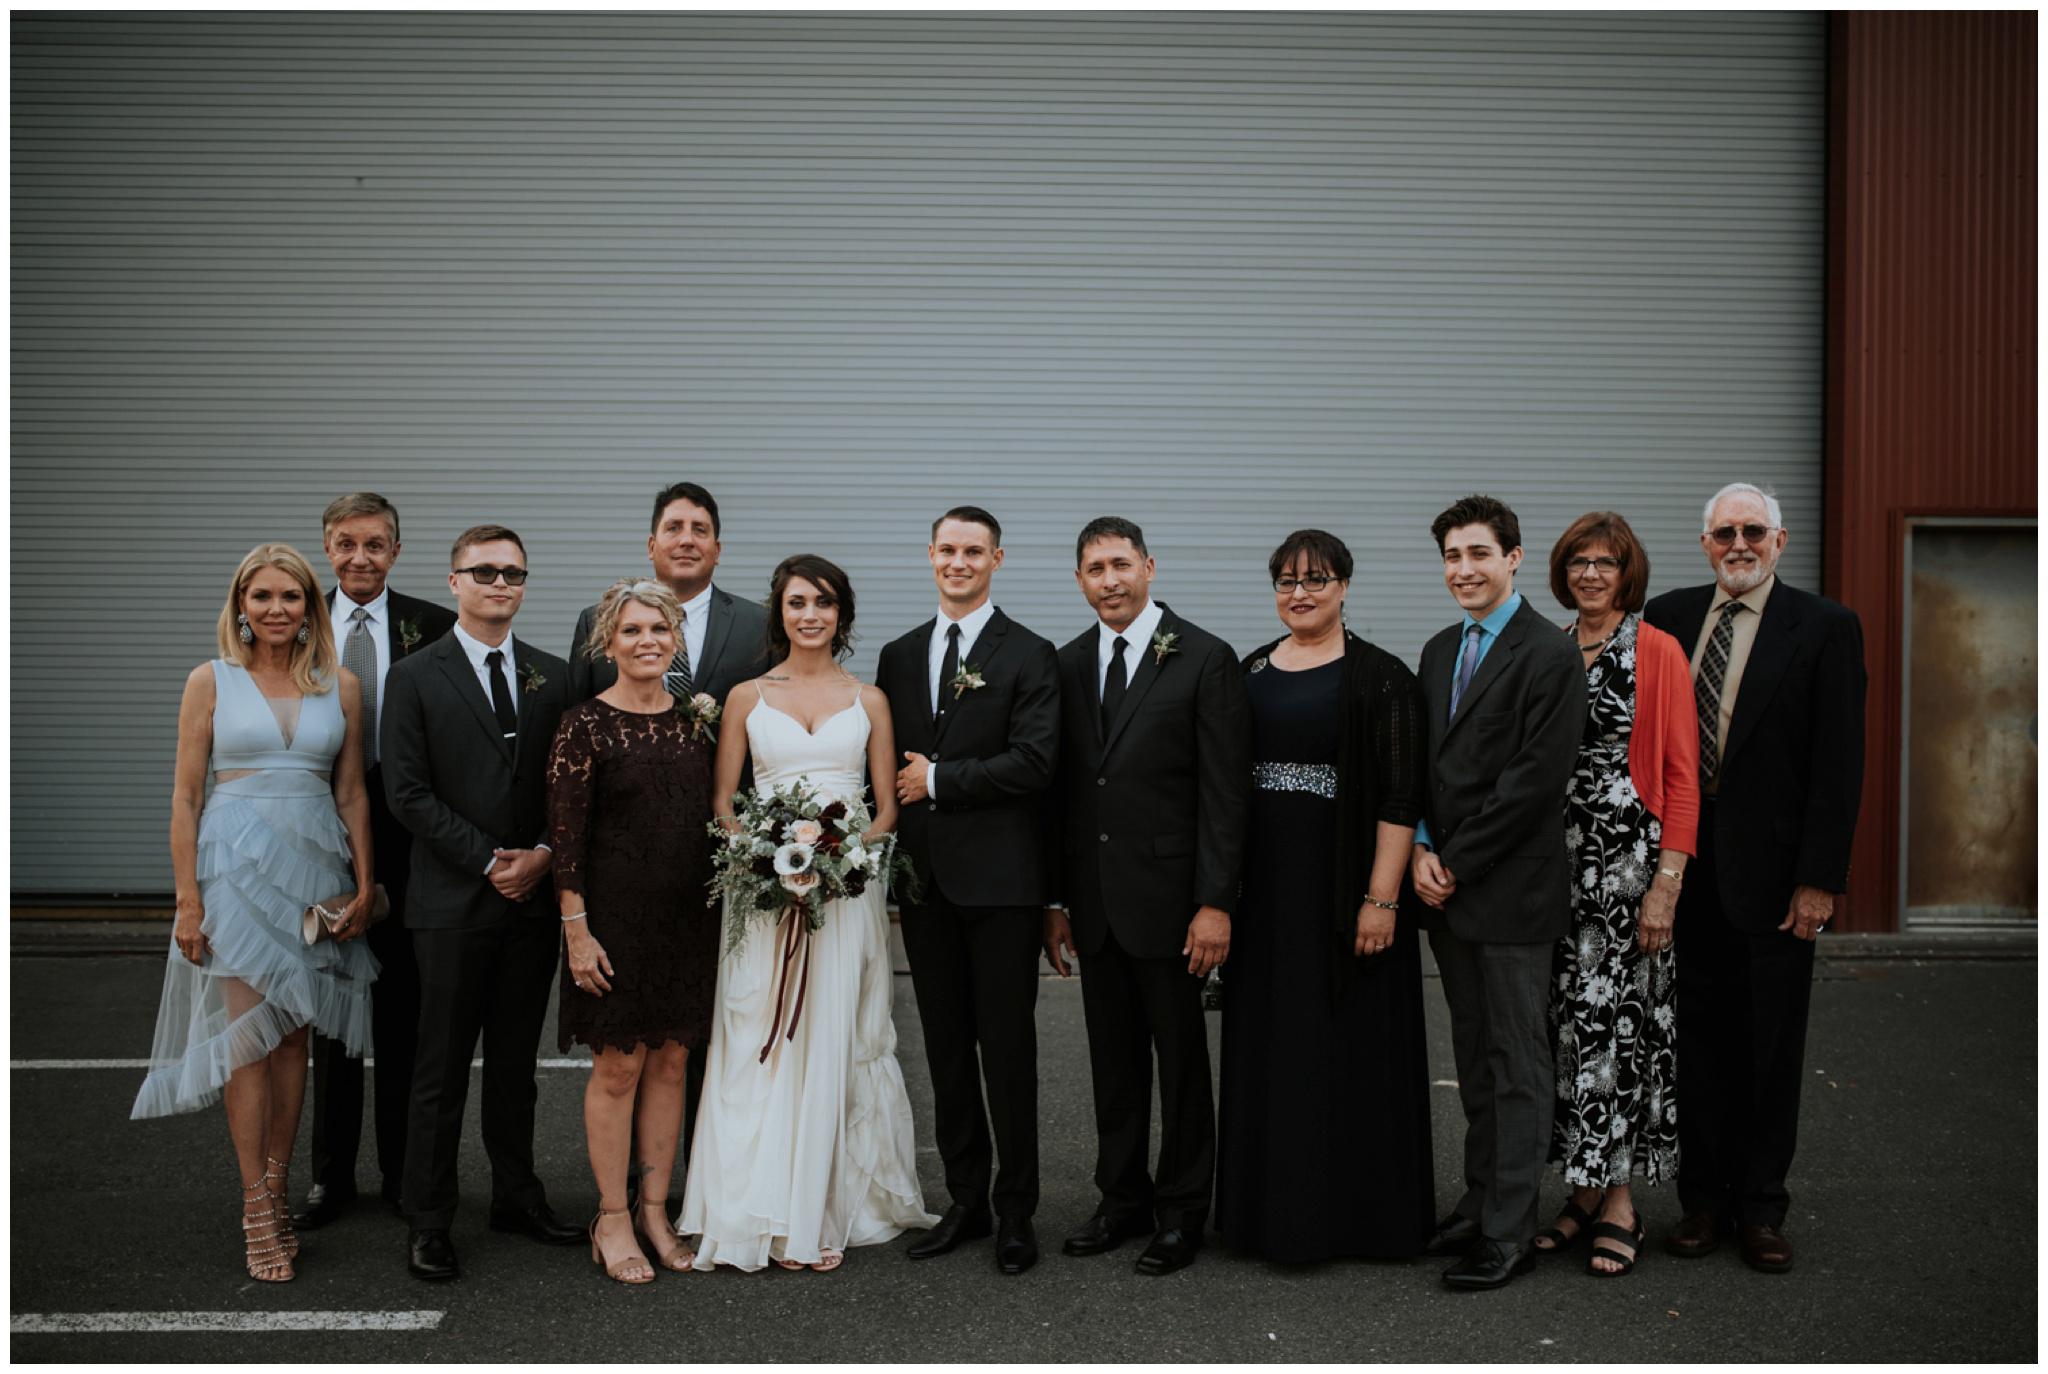 alyssa-keiran-westland-distillery-urban-seattle-wedding-photographer-caitlyn-nikula-125.jpg